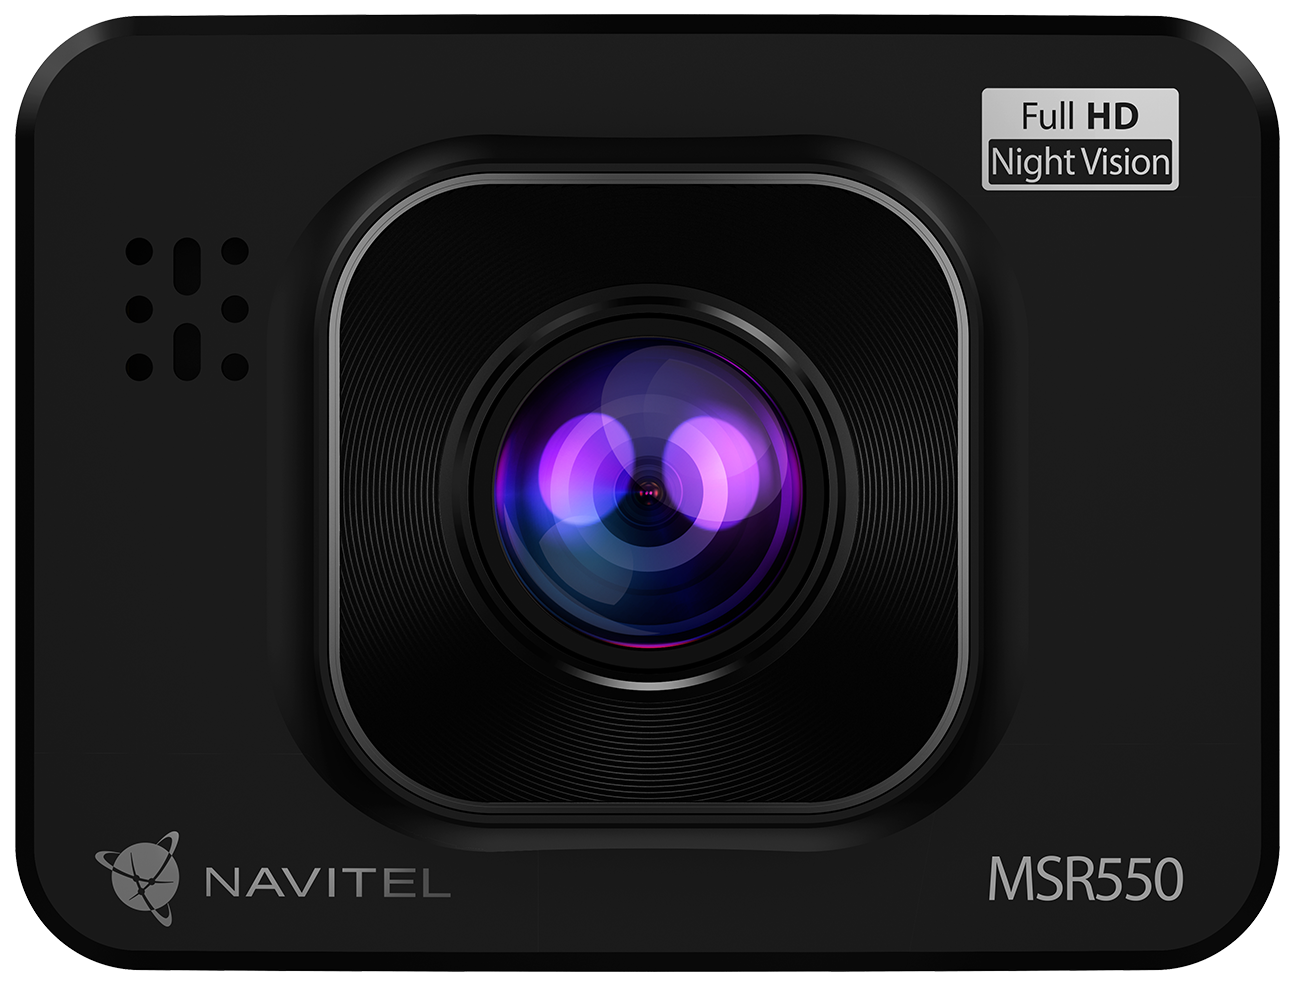 NAVITEL MSR550 NV – budżetowa kamera z sensorem Night Vision